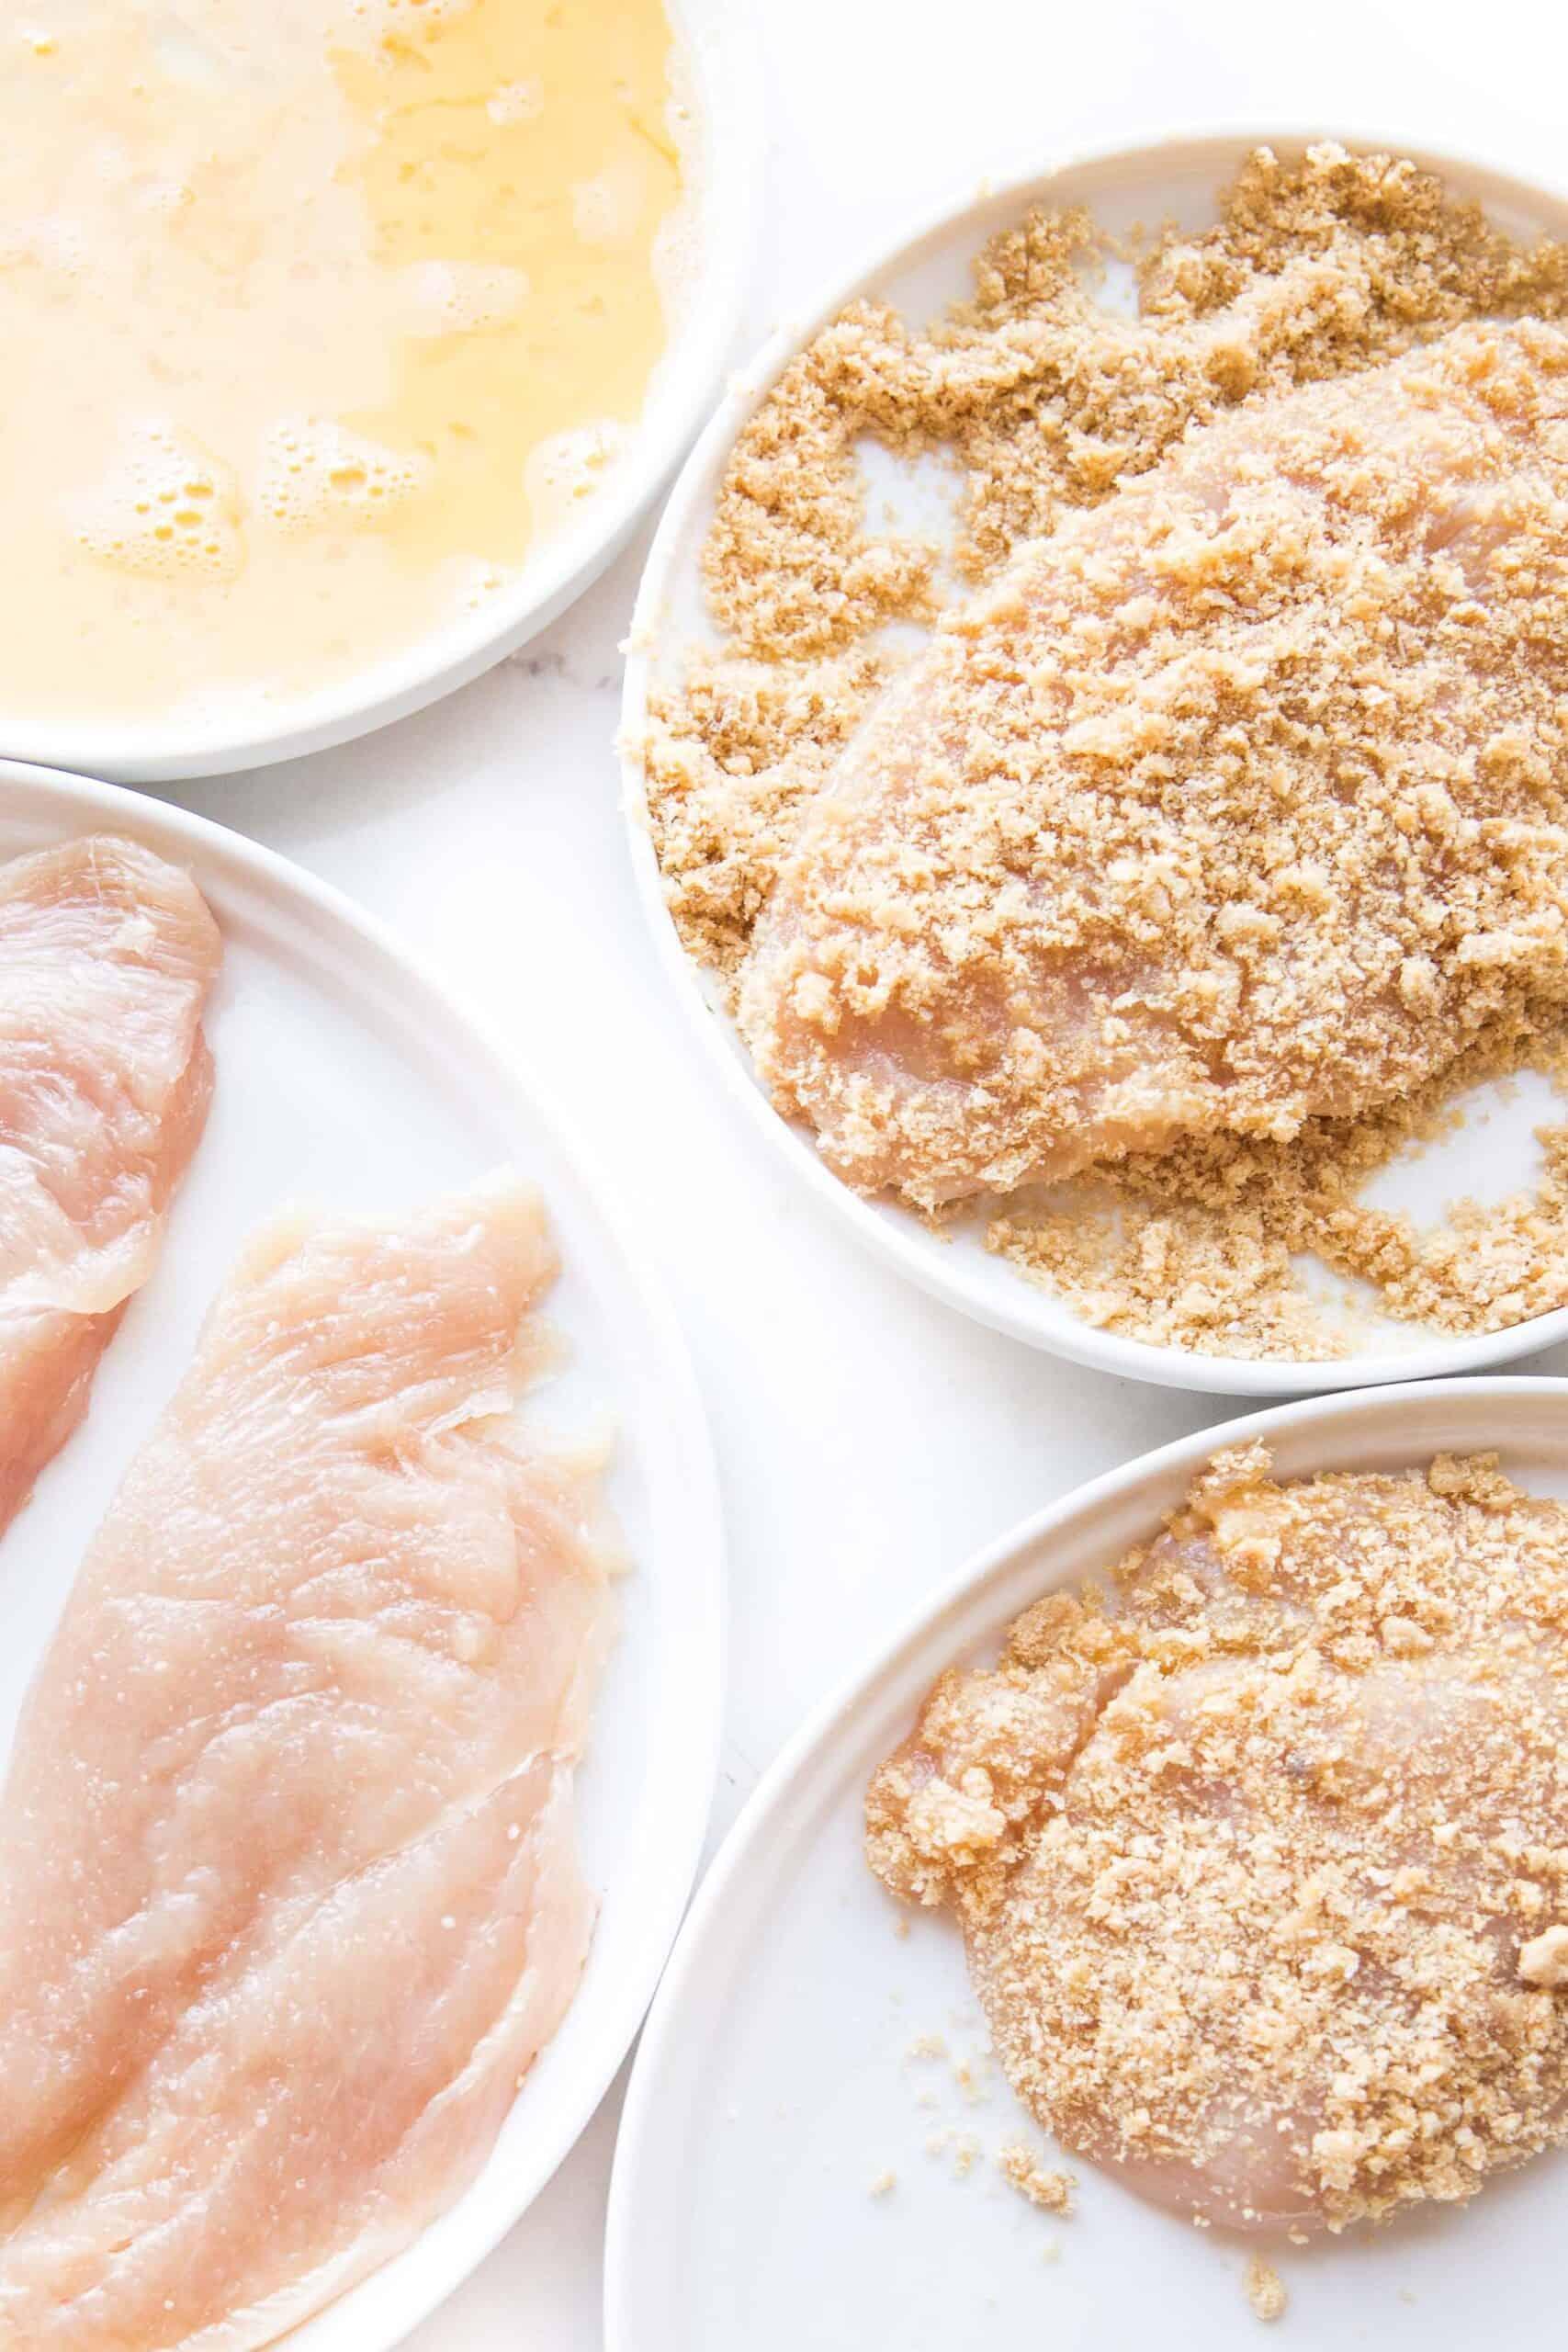 steps to dredging chicken parmesan